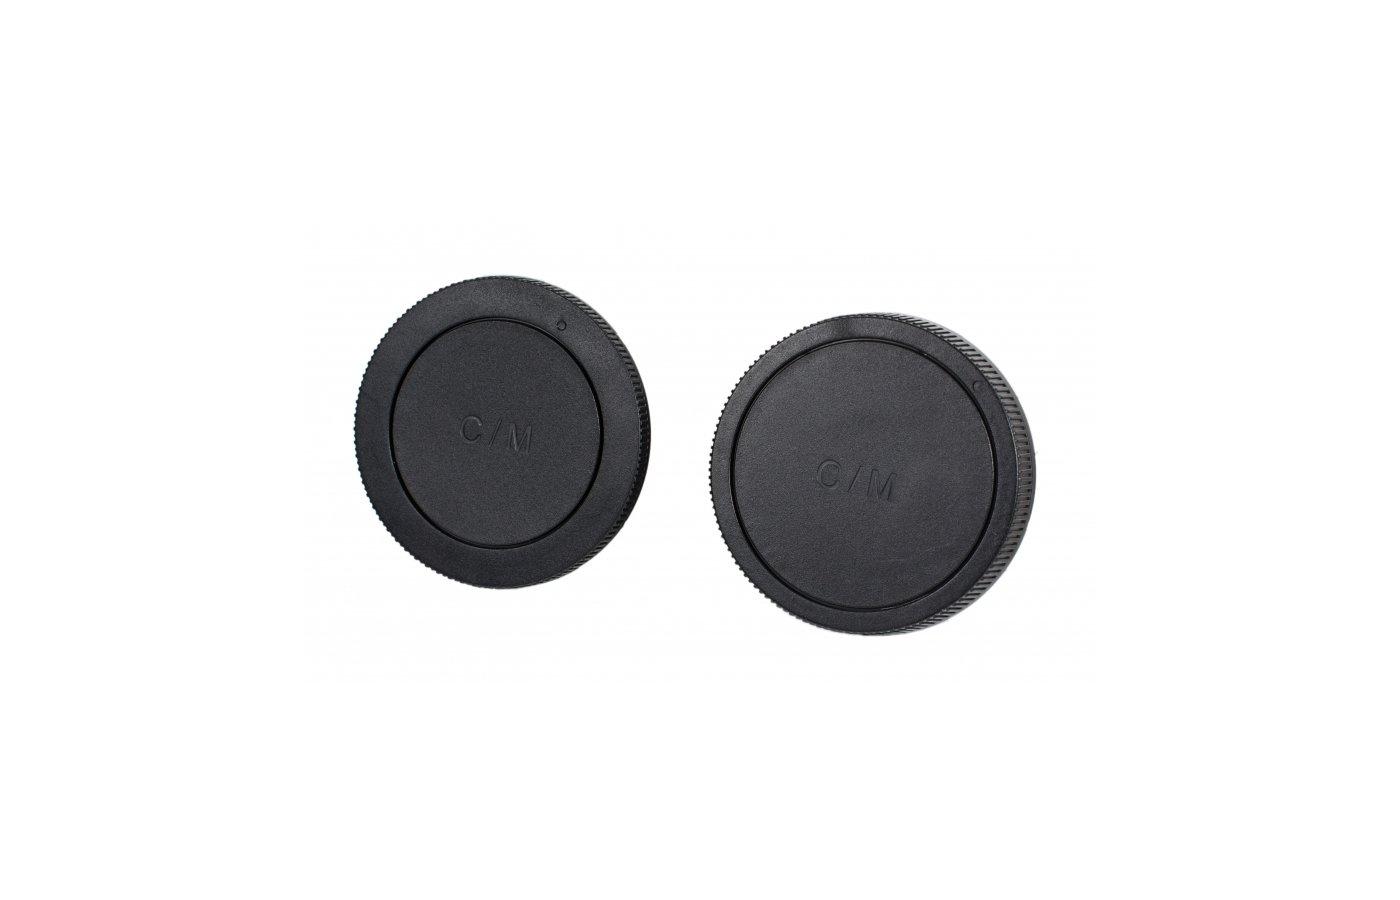 Бленда JJC крышка для объектива задняя + крышка байонета камеры Canon EOS M